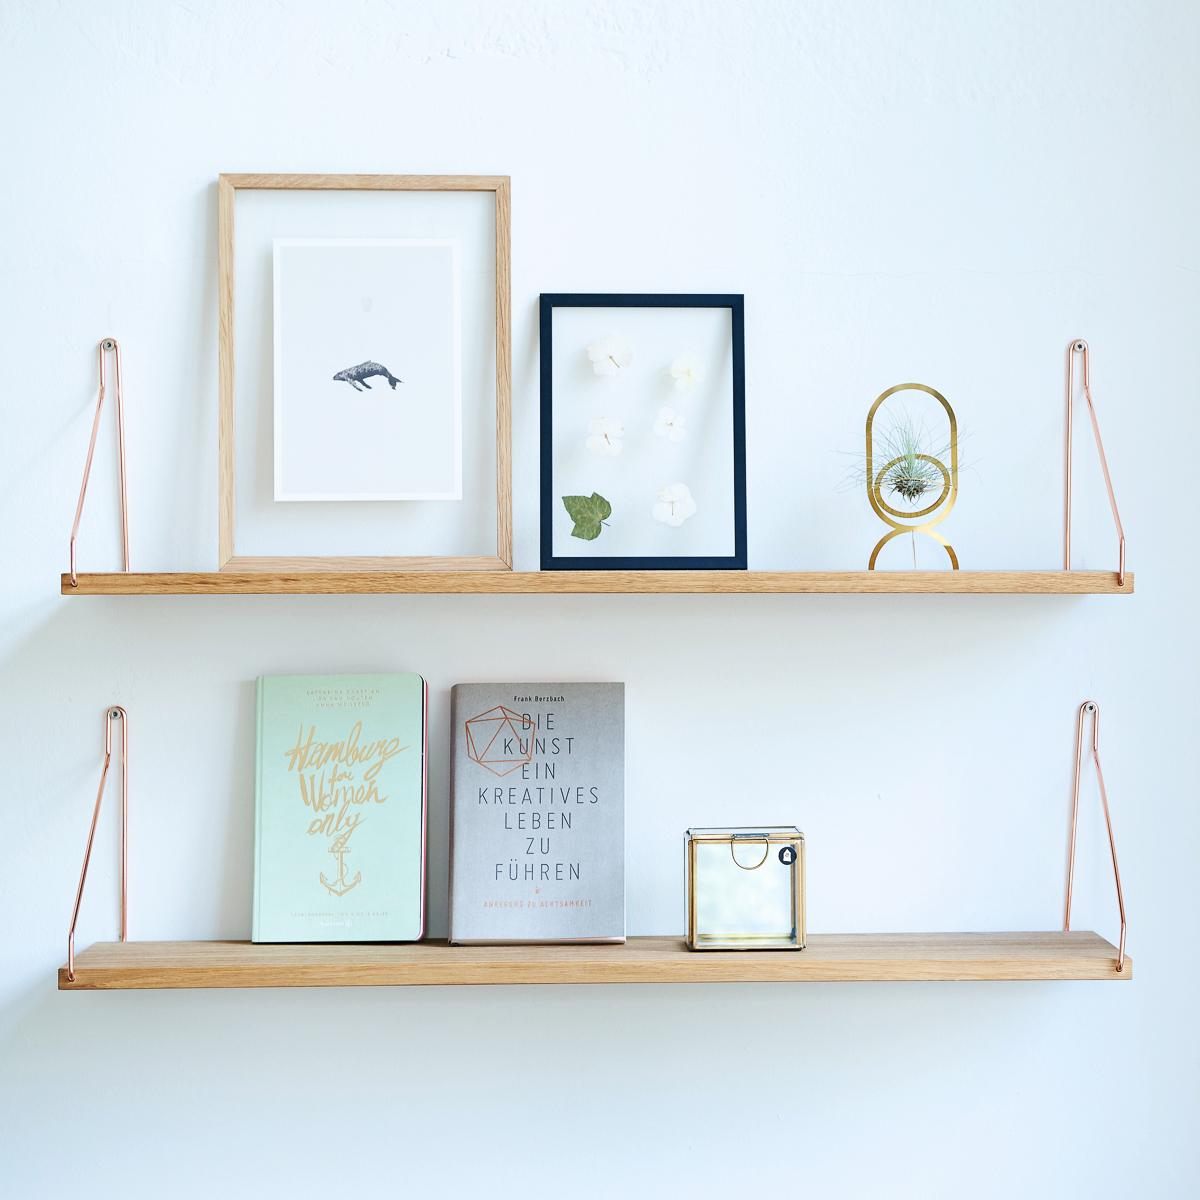 sch n ehrlich in wintehude hamburg creme guides. Black Bedroom Furniture Sets. Home Design Ideas